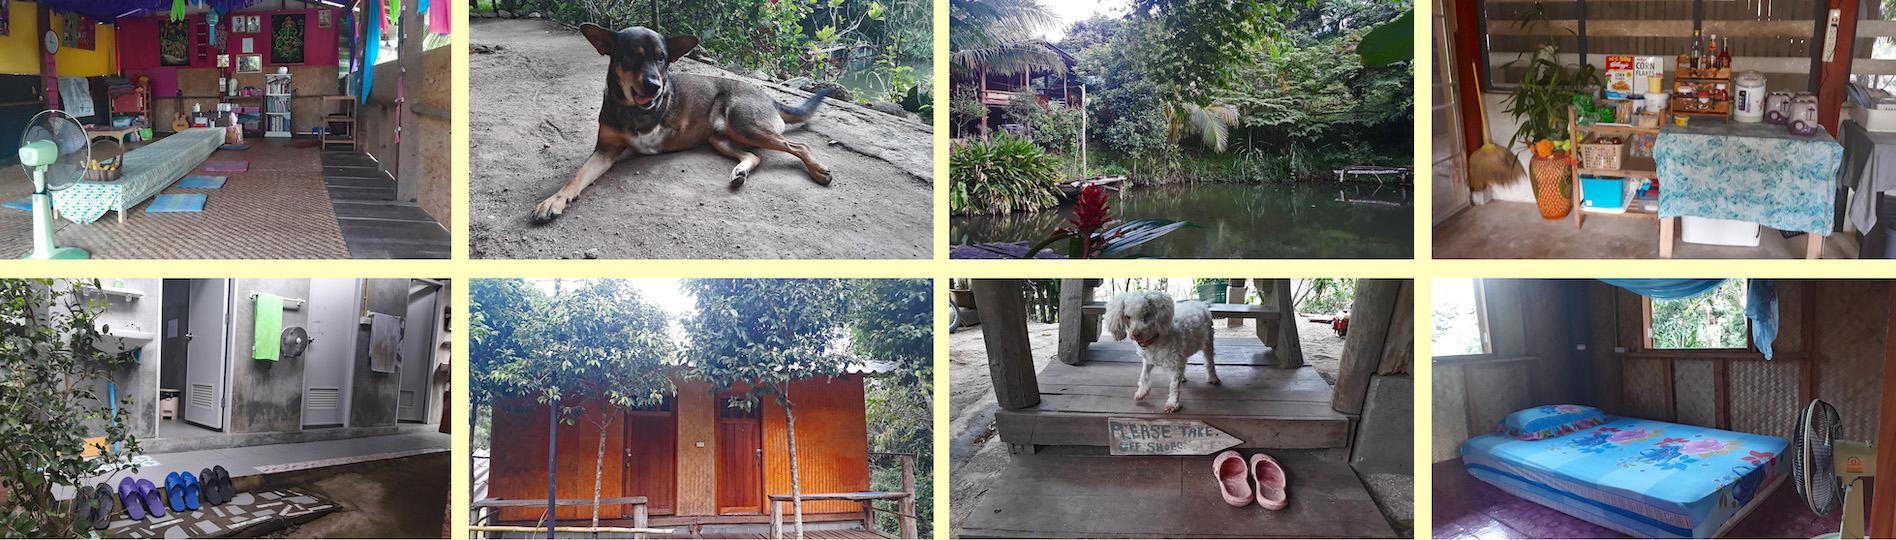 Visit Us - Accommodation Collage